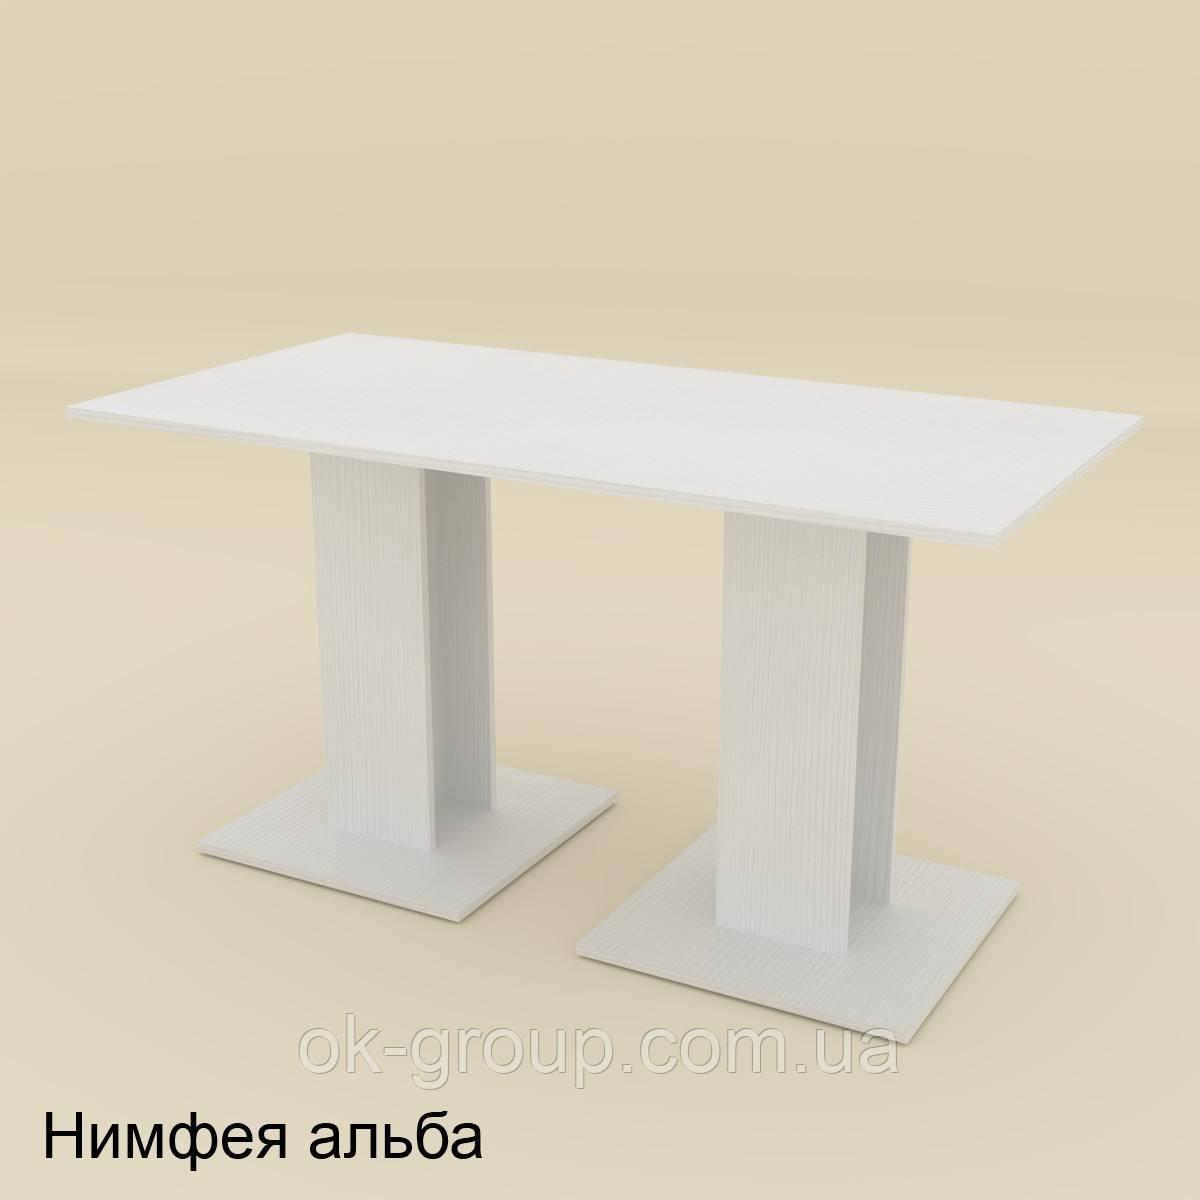 Стол кухонный на двух ножках КС-8 компанит